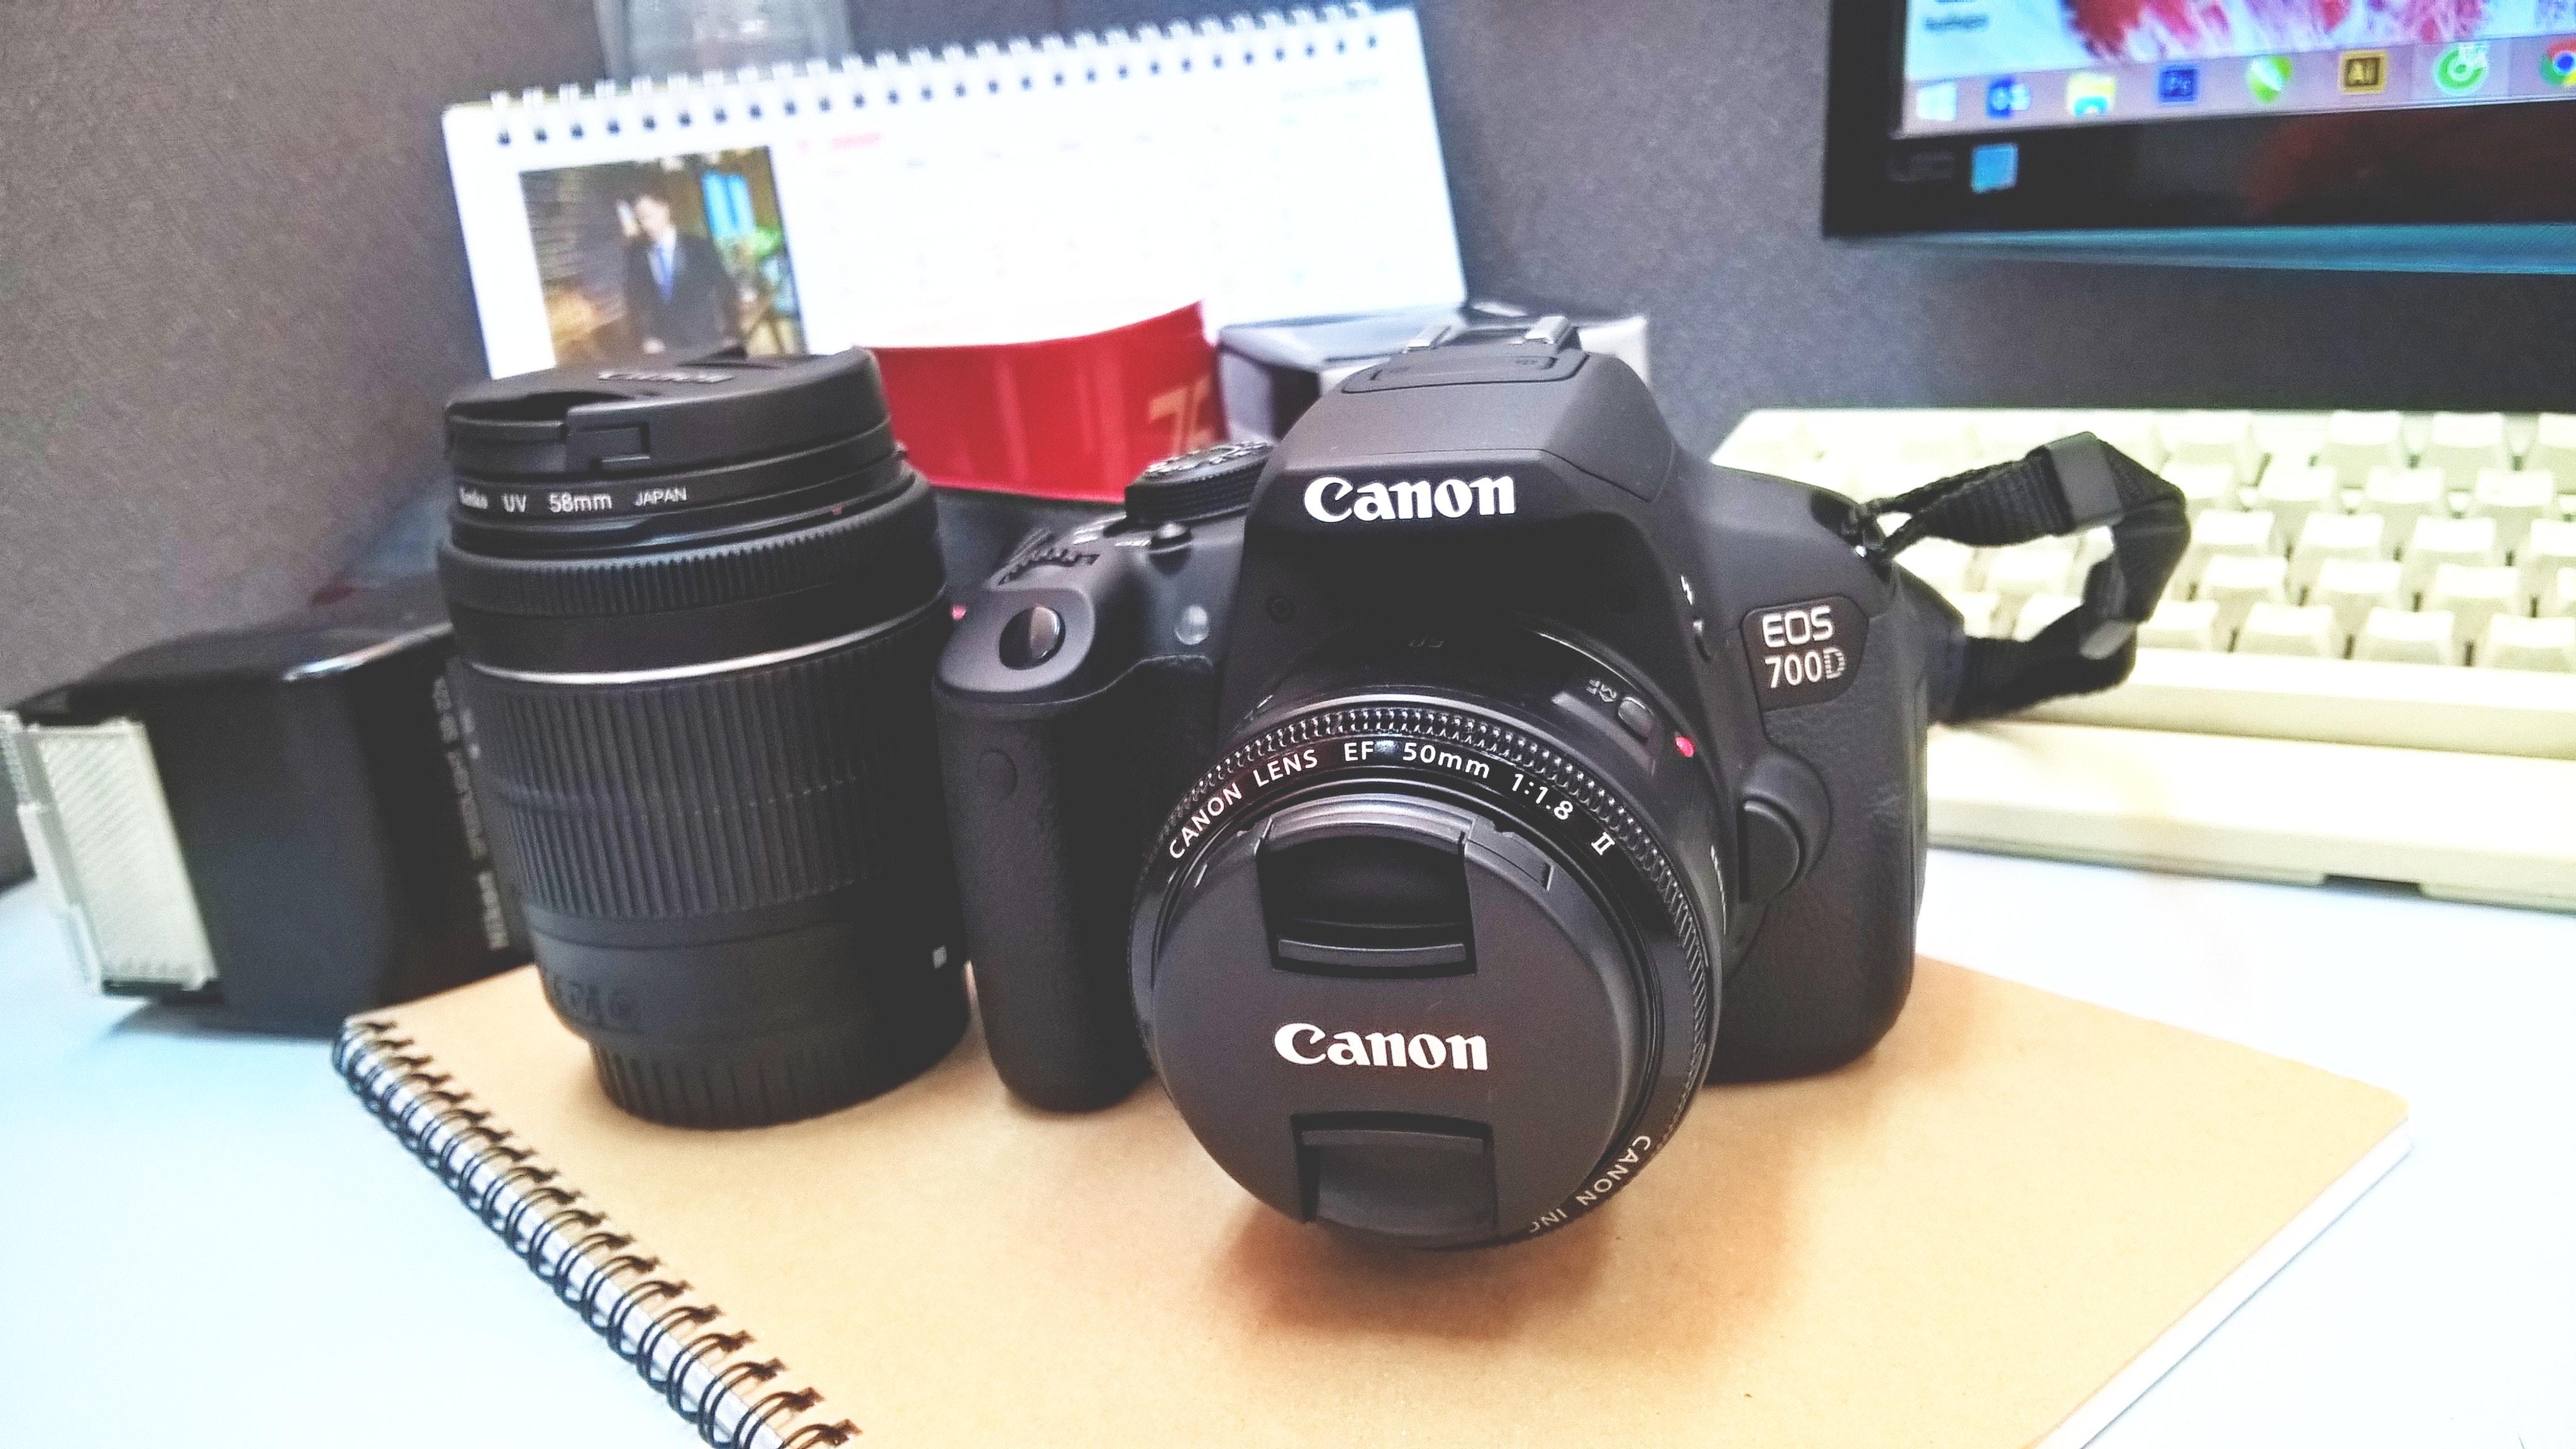 Canon Eos 7000 Dslr Camera Free Stock Photo